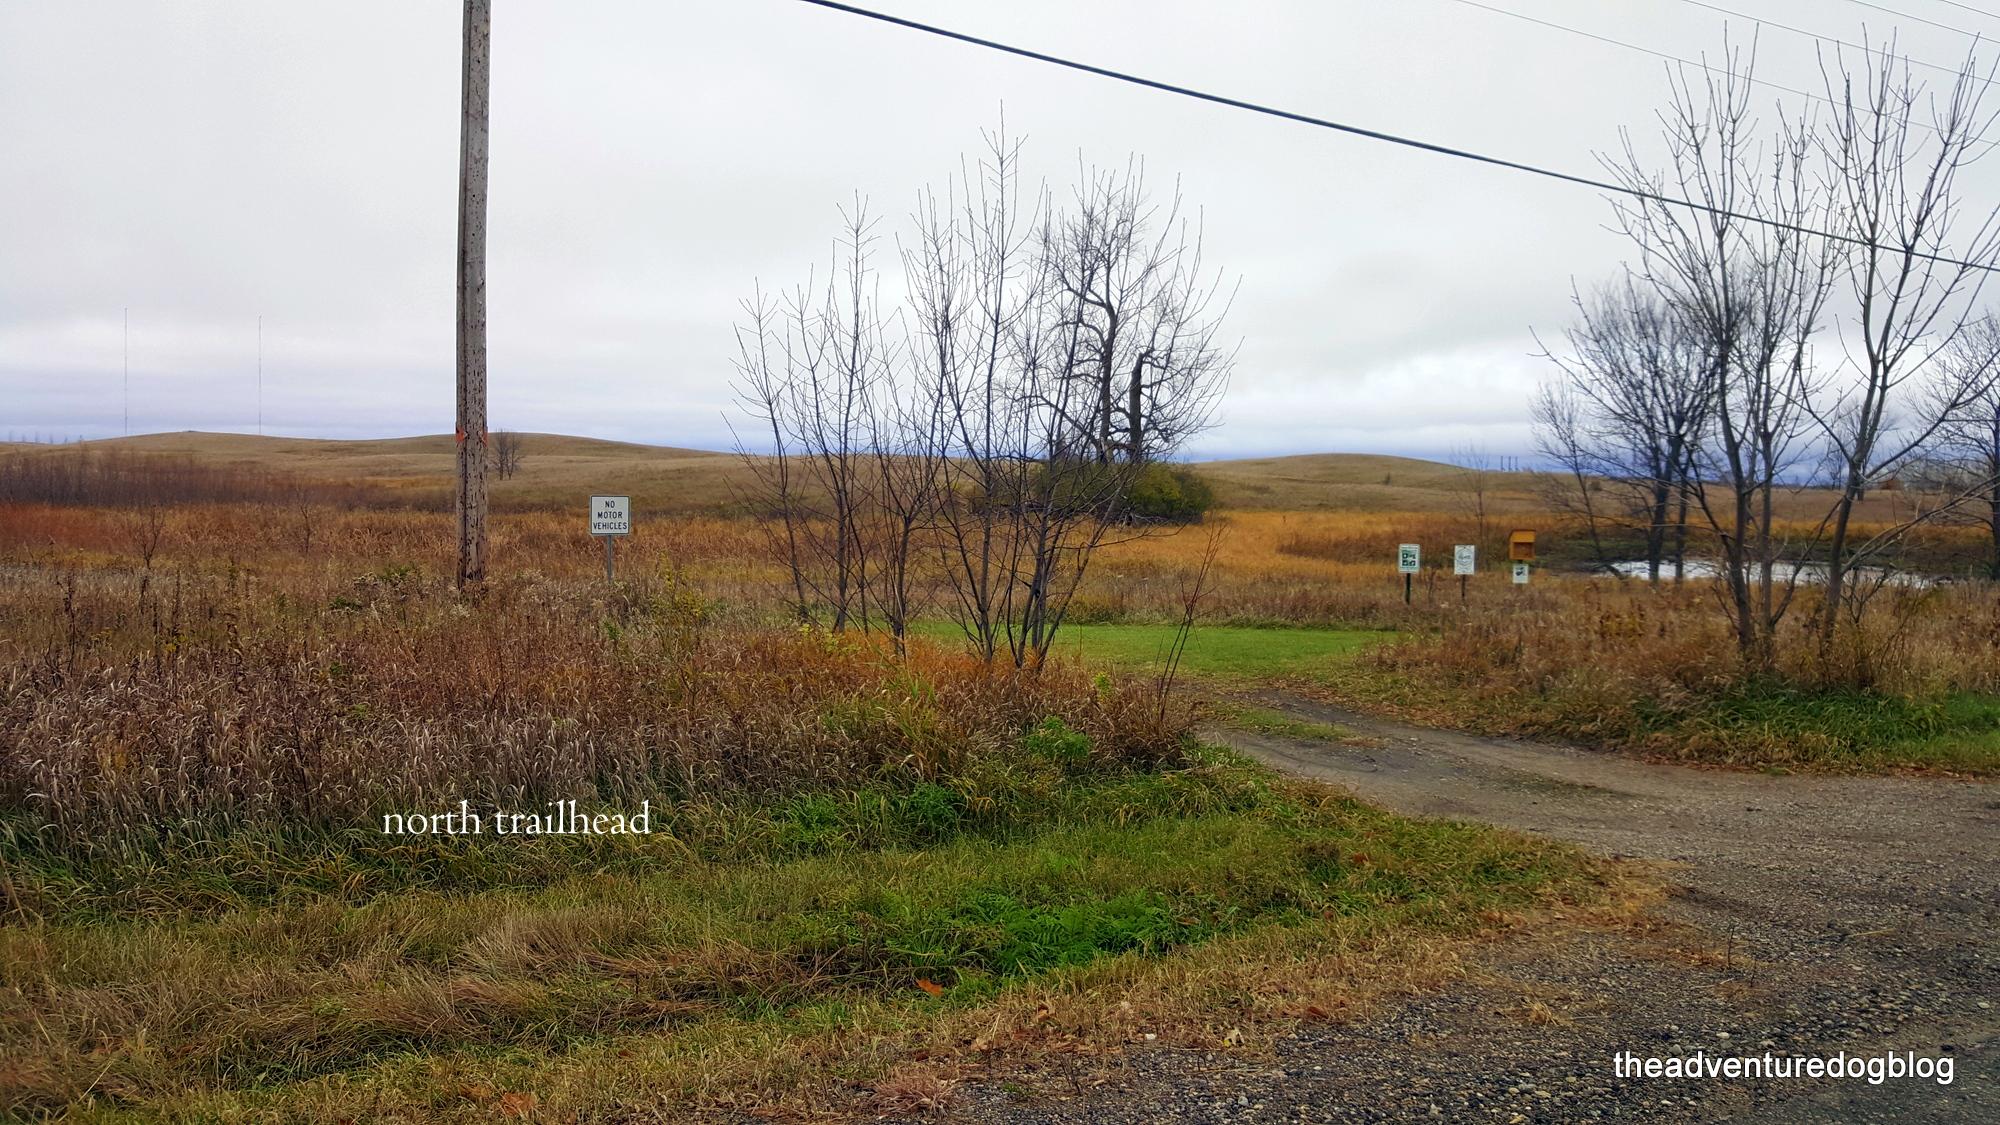 north trailhead